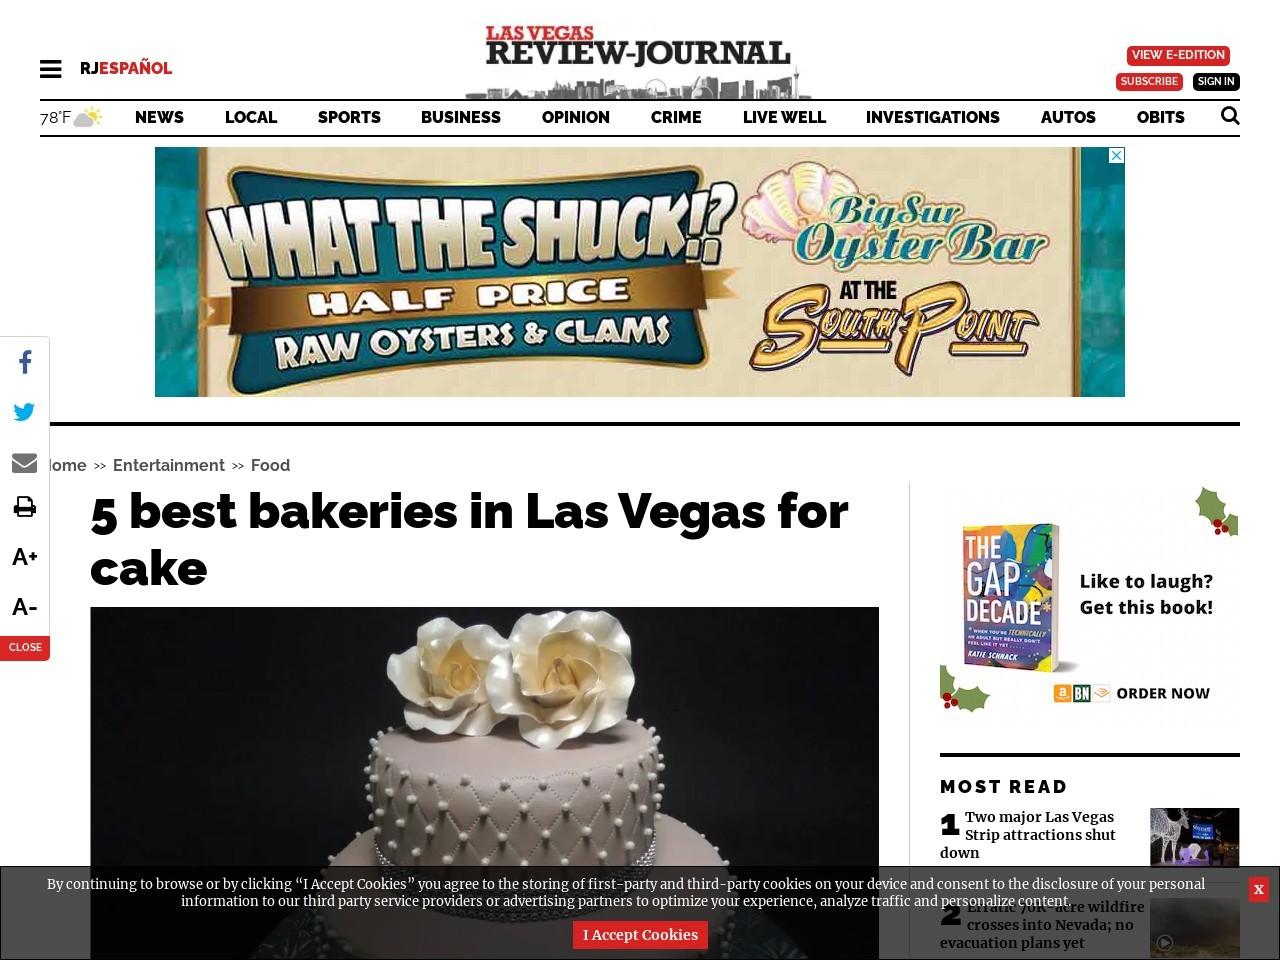 5 best bakeries to get a cake in Las Vegas